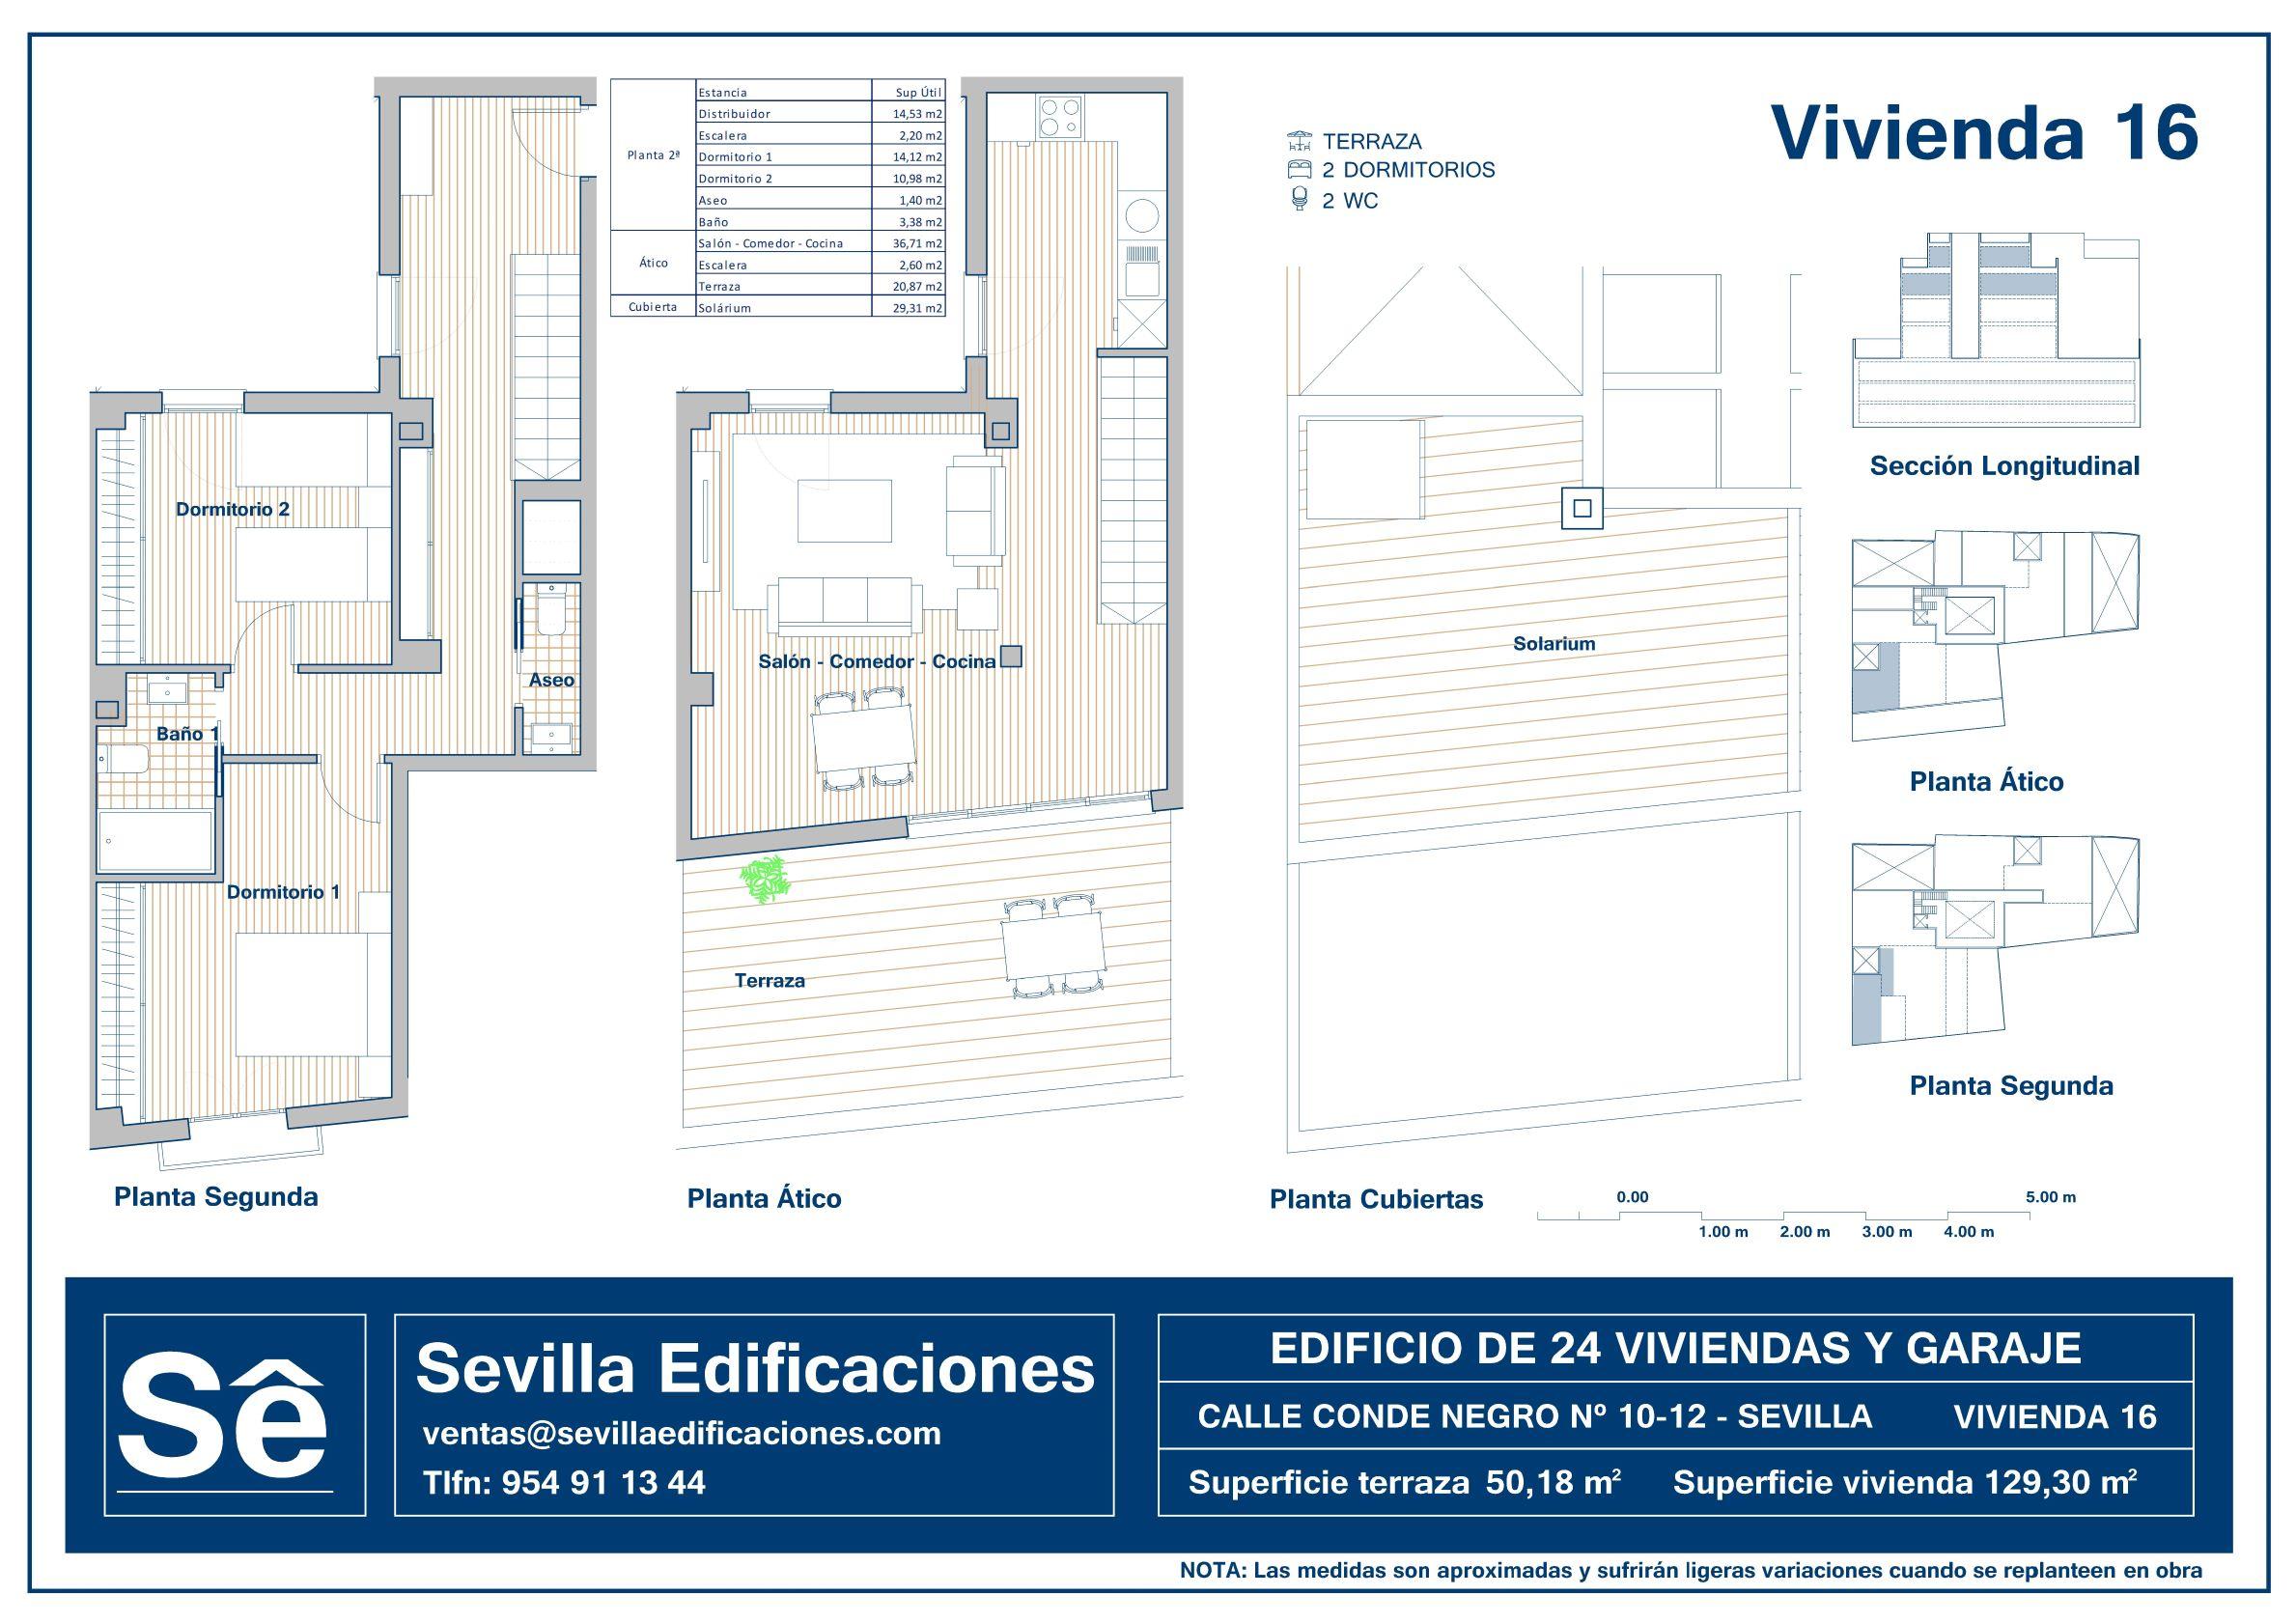 CONDENEGRO_VIVIENDA_16